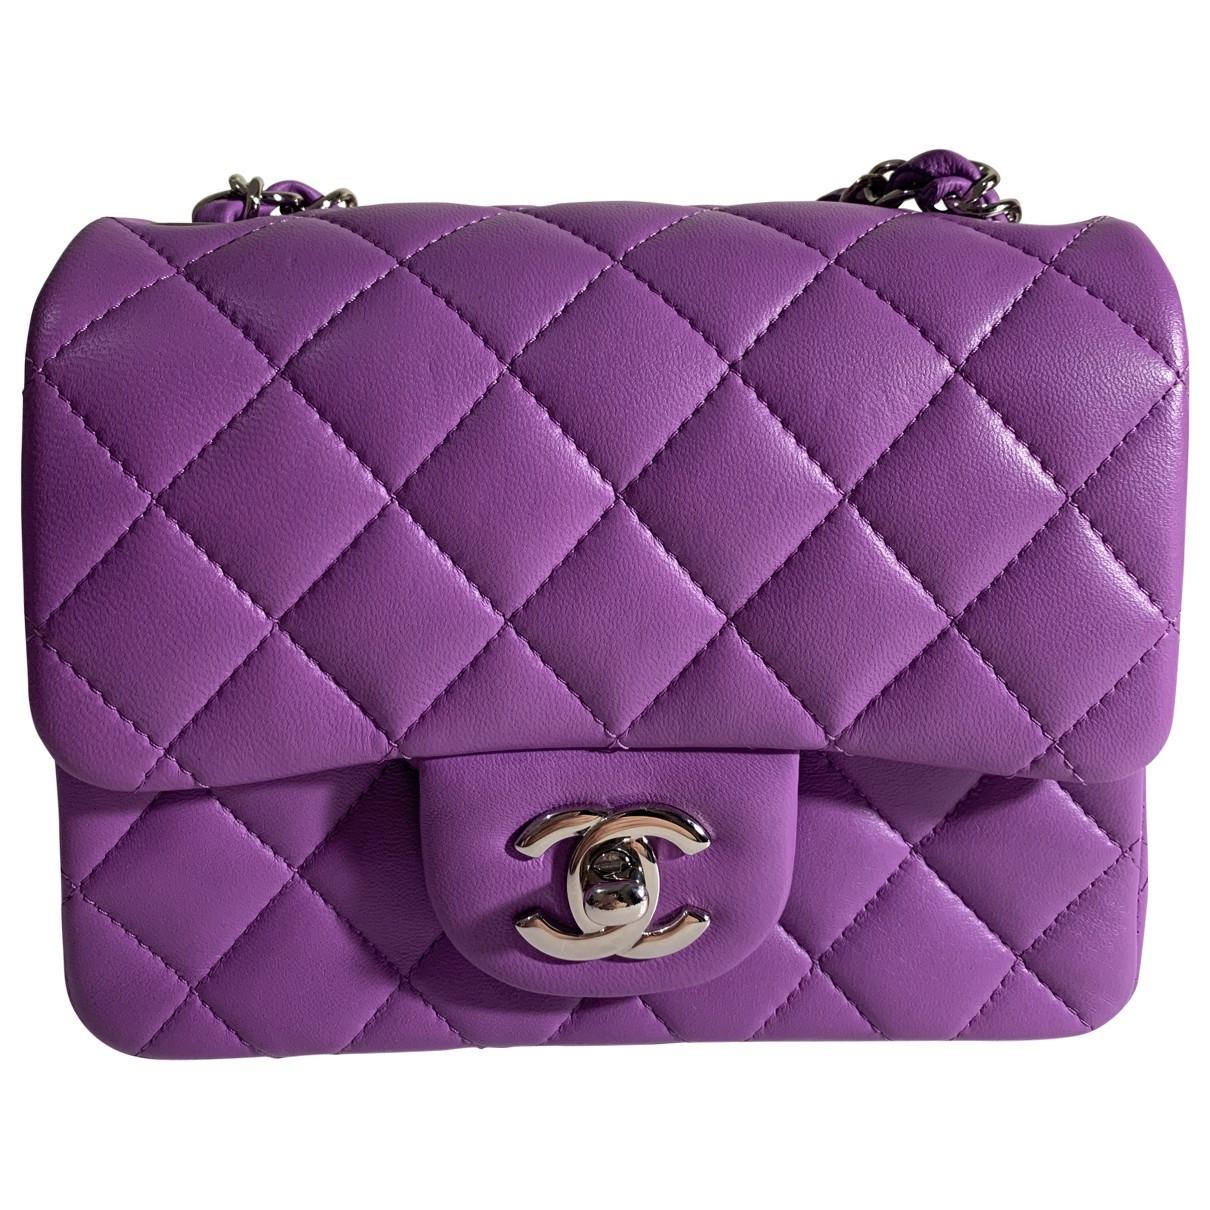 Chanel Timeless/Classique Handtasche in  Lila Leder